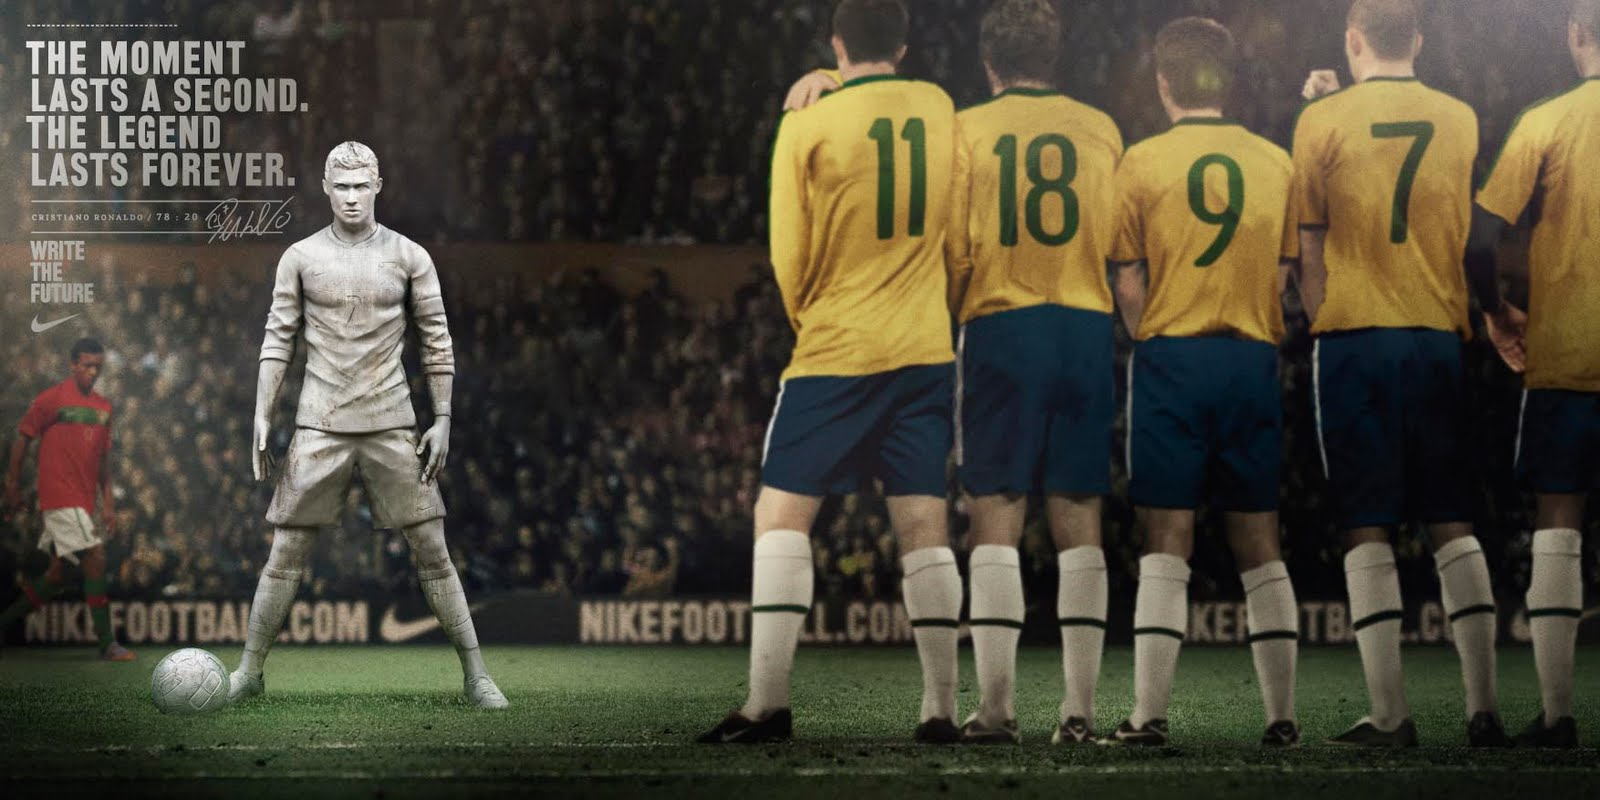 http://2.bp.blogspot.com/_NicMEoXV14w/TBI1JOXxl1I/AAAAAAAAC6w/RI9hMOitdxI/s1600/nike_write_future_Ronaldo.jpg